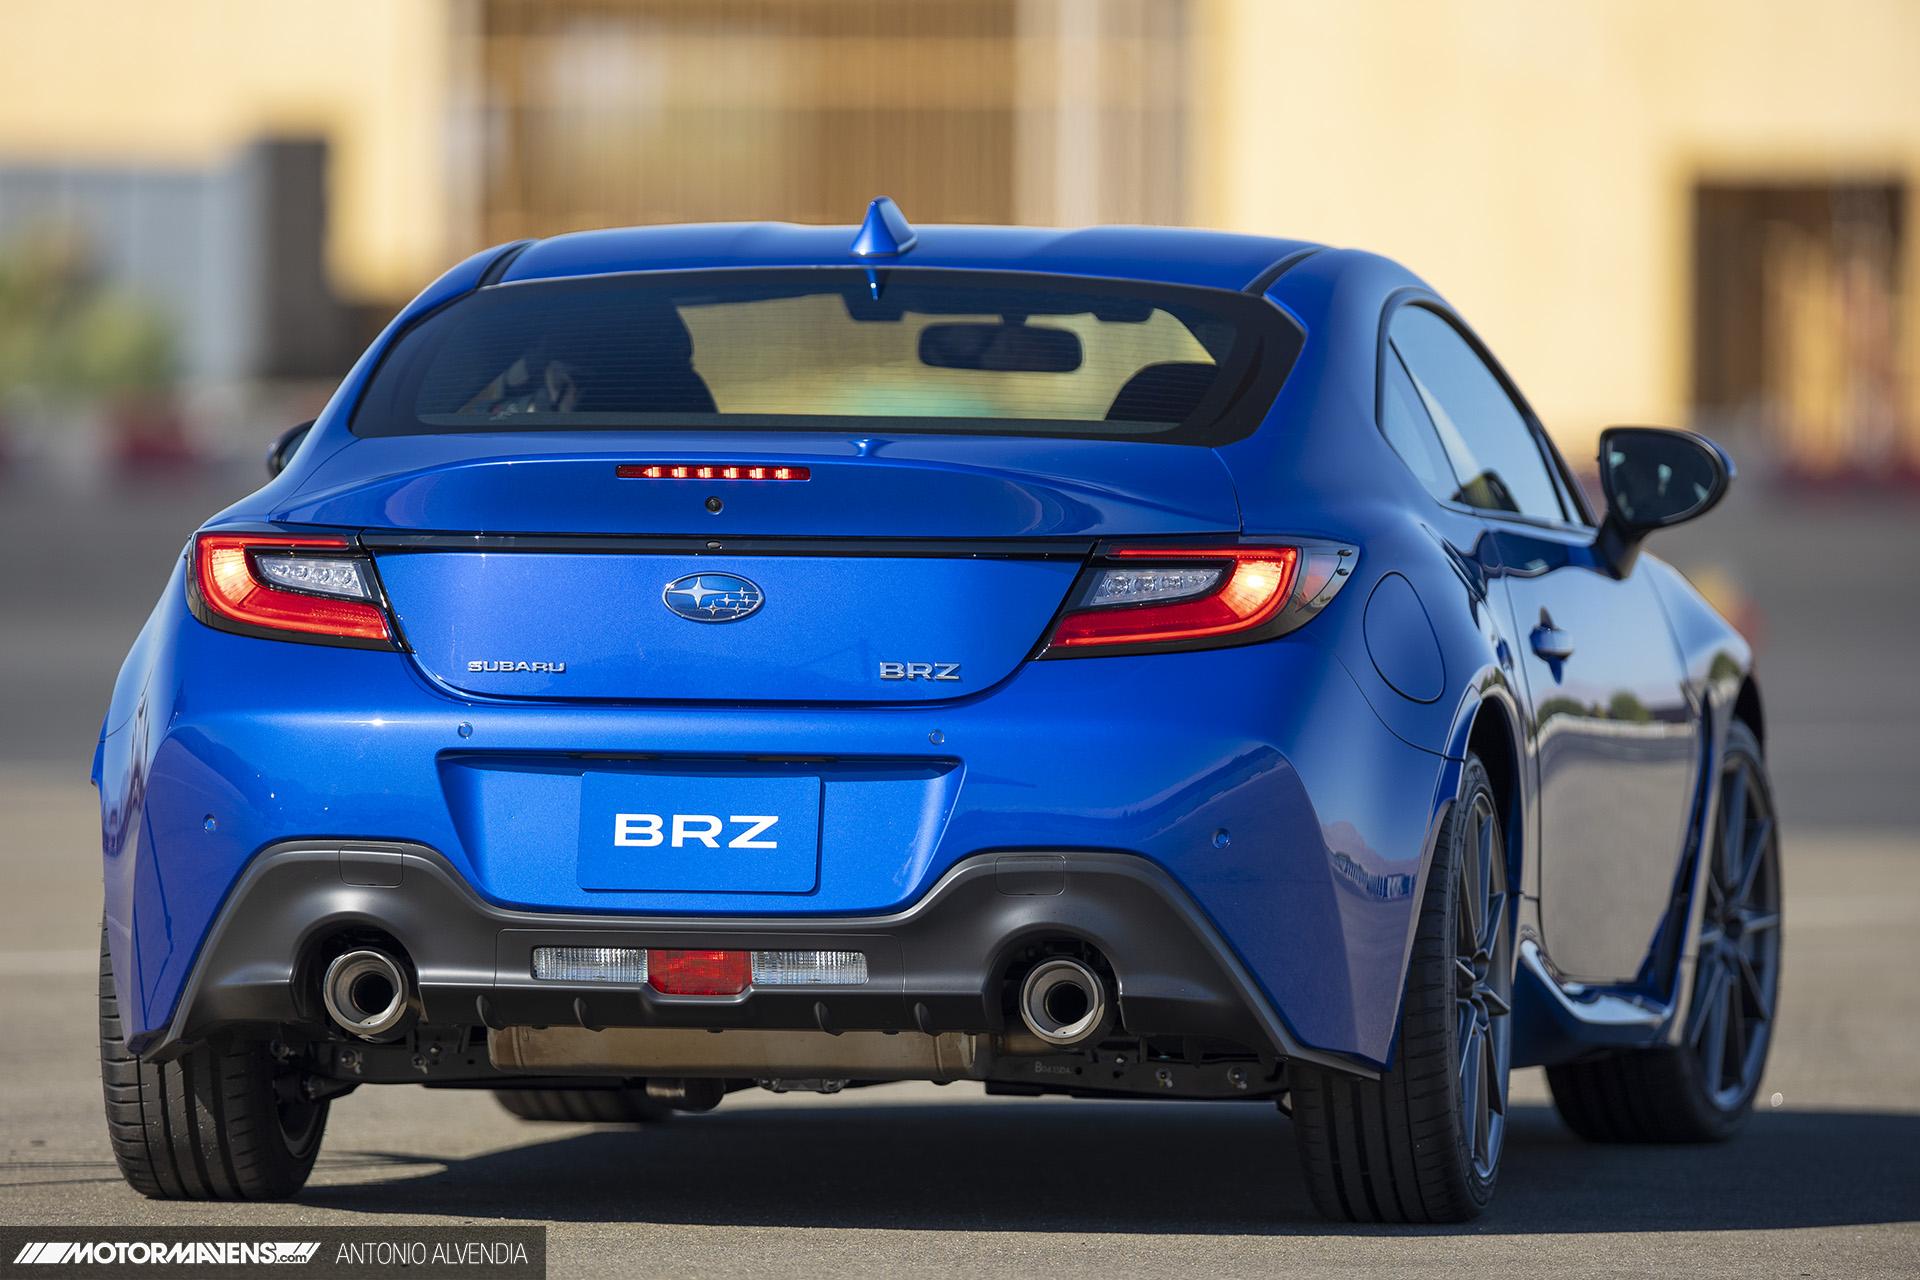 2022 Subaru BRZ First Look Thermal Club FA20 R6A_3334 aa1920wm